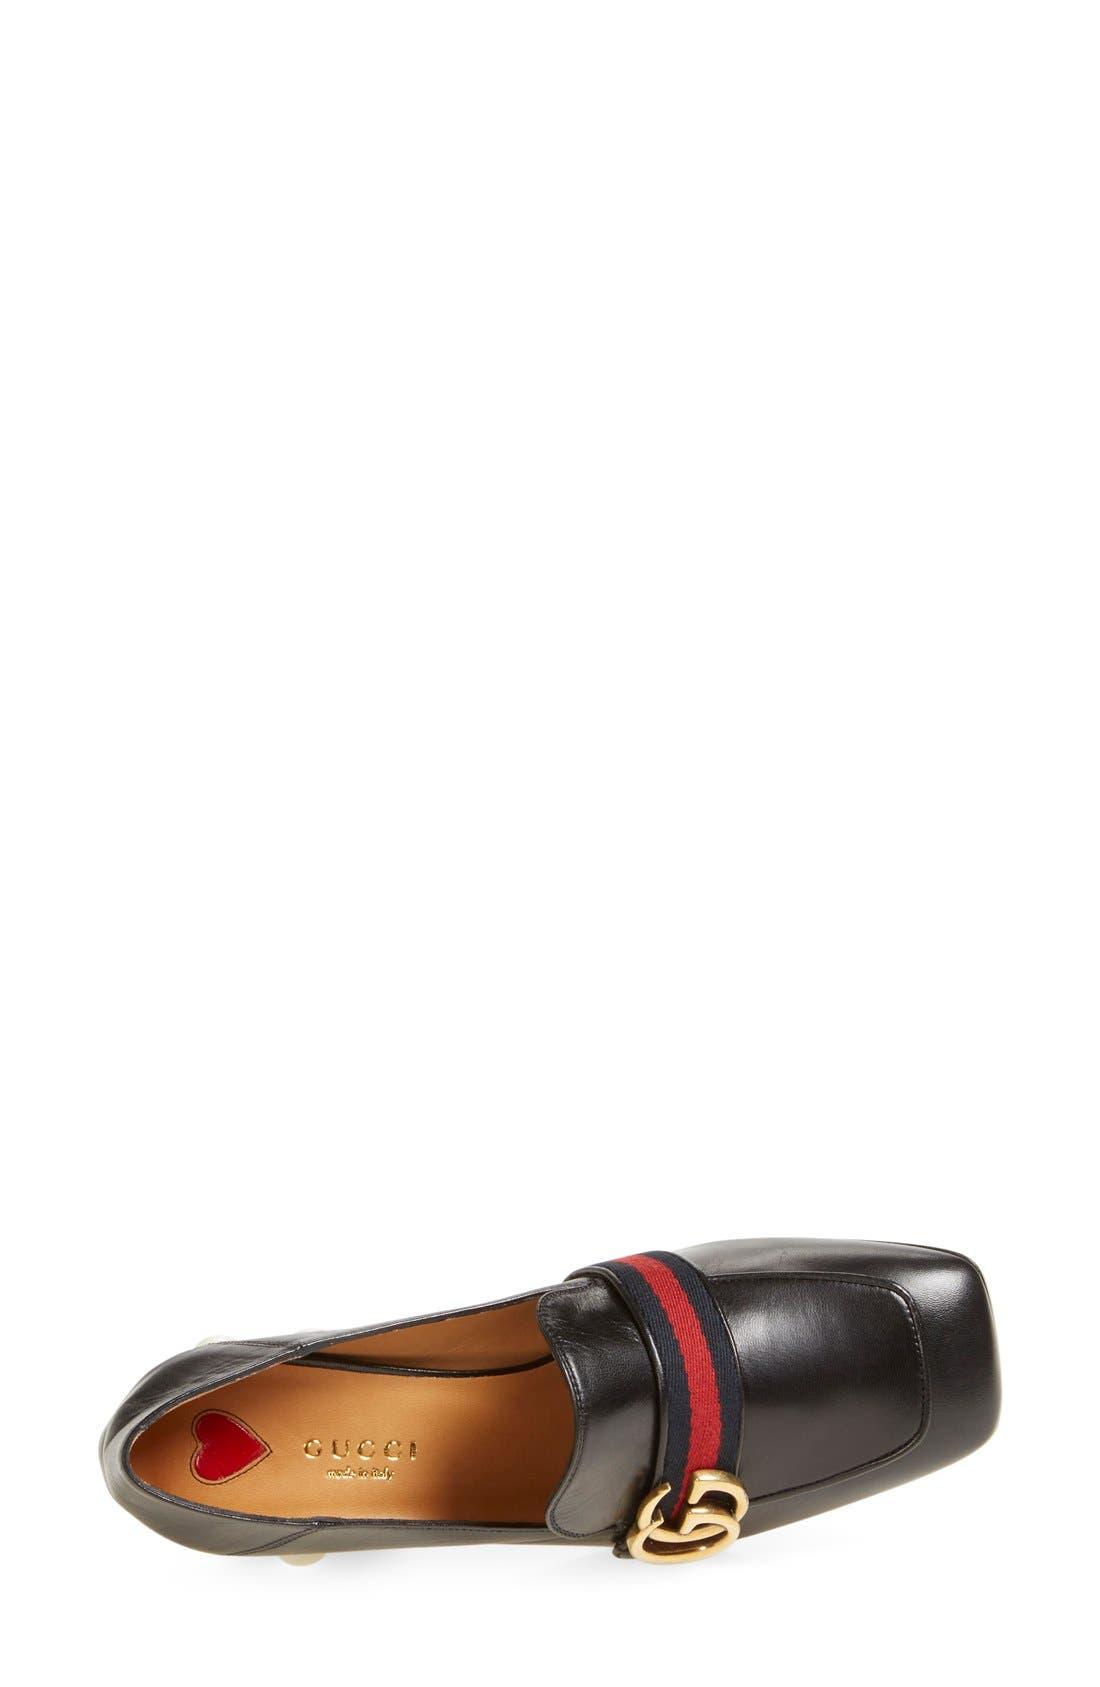 Alternate Image 3  - Gucci 'Peyton' Square Toe Loafer Pump (Women)